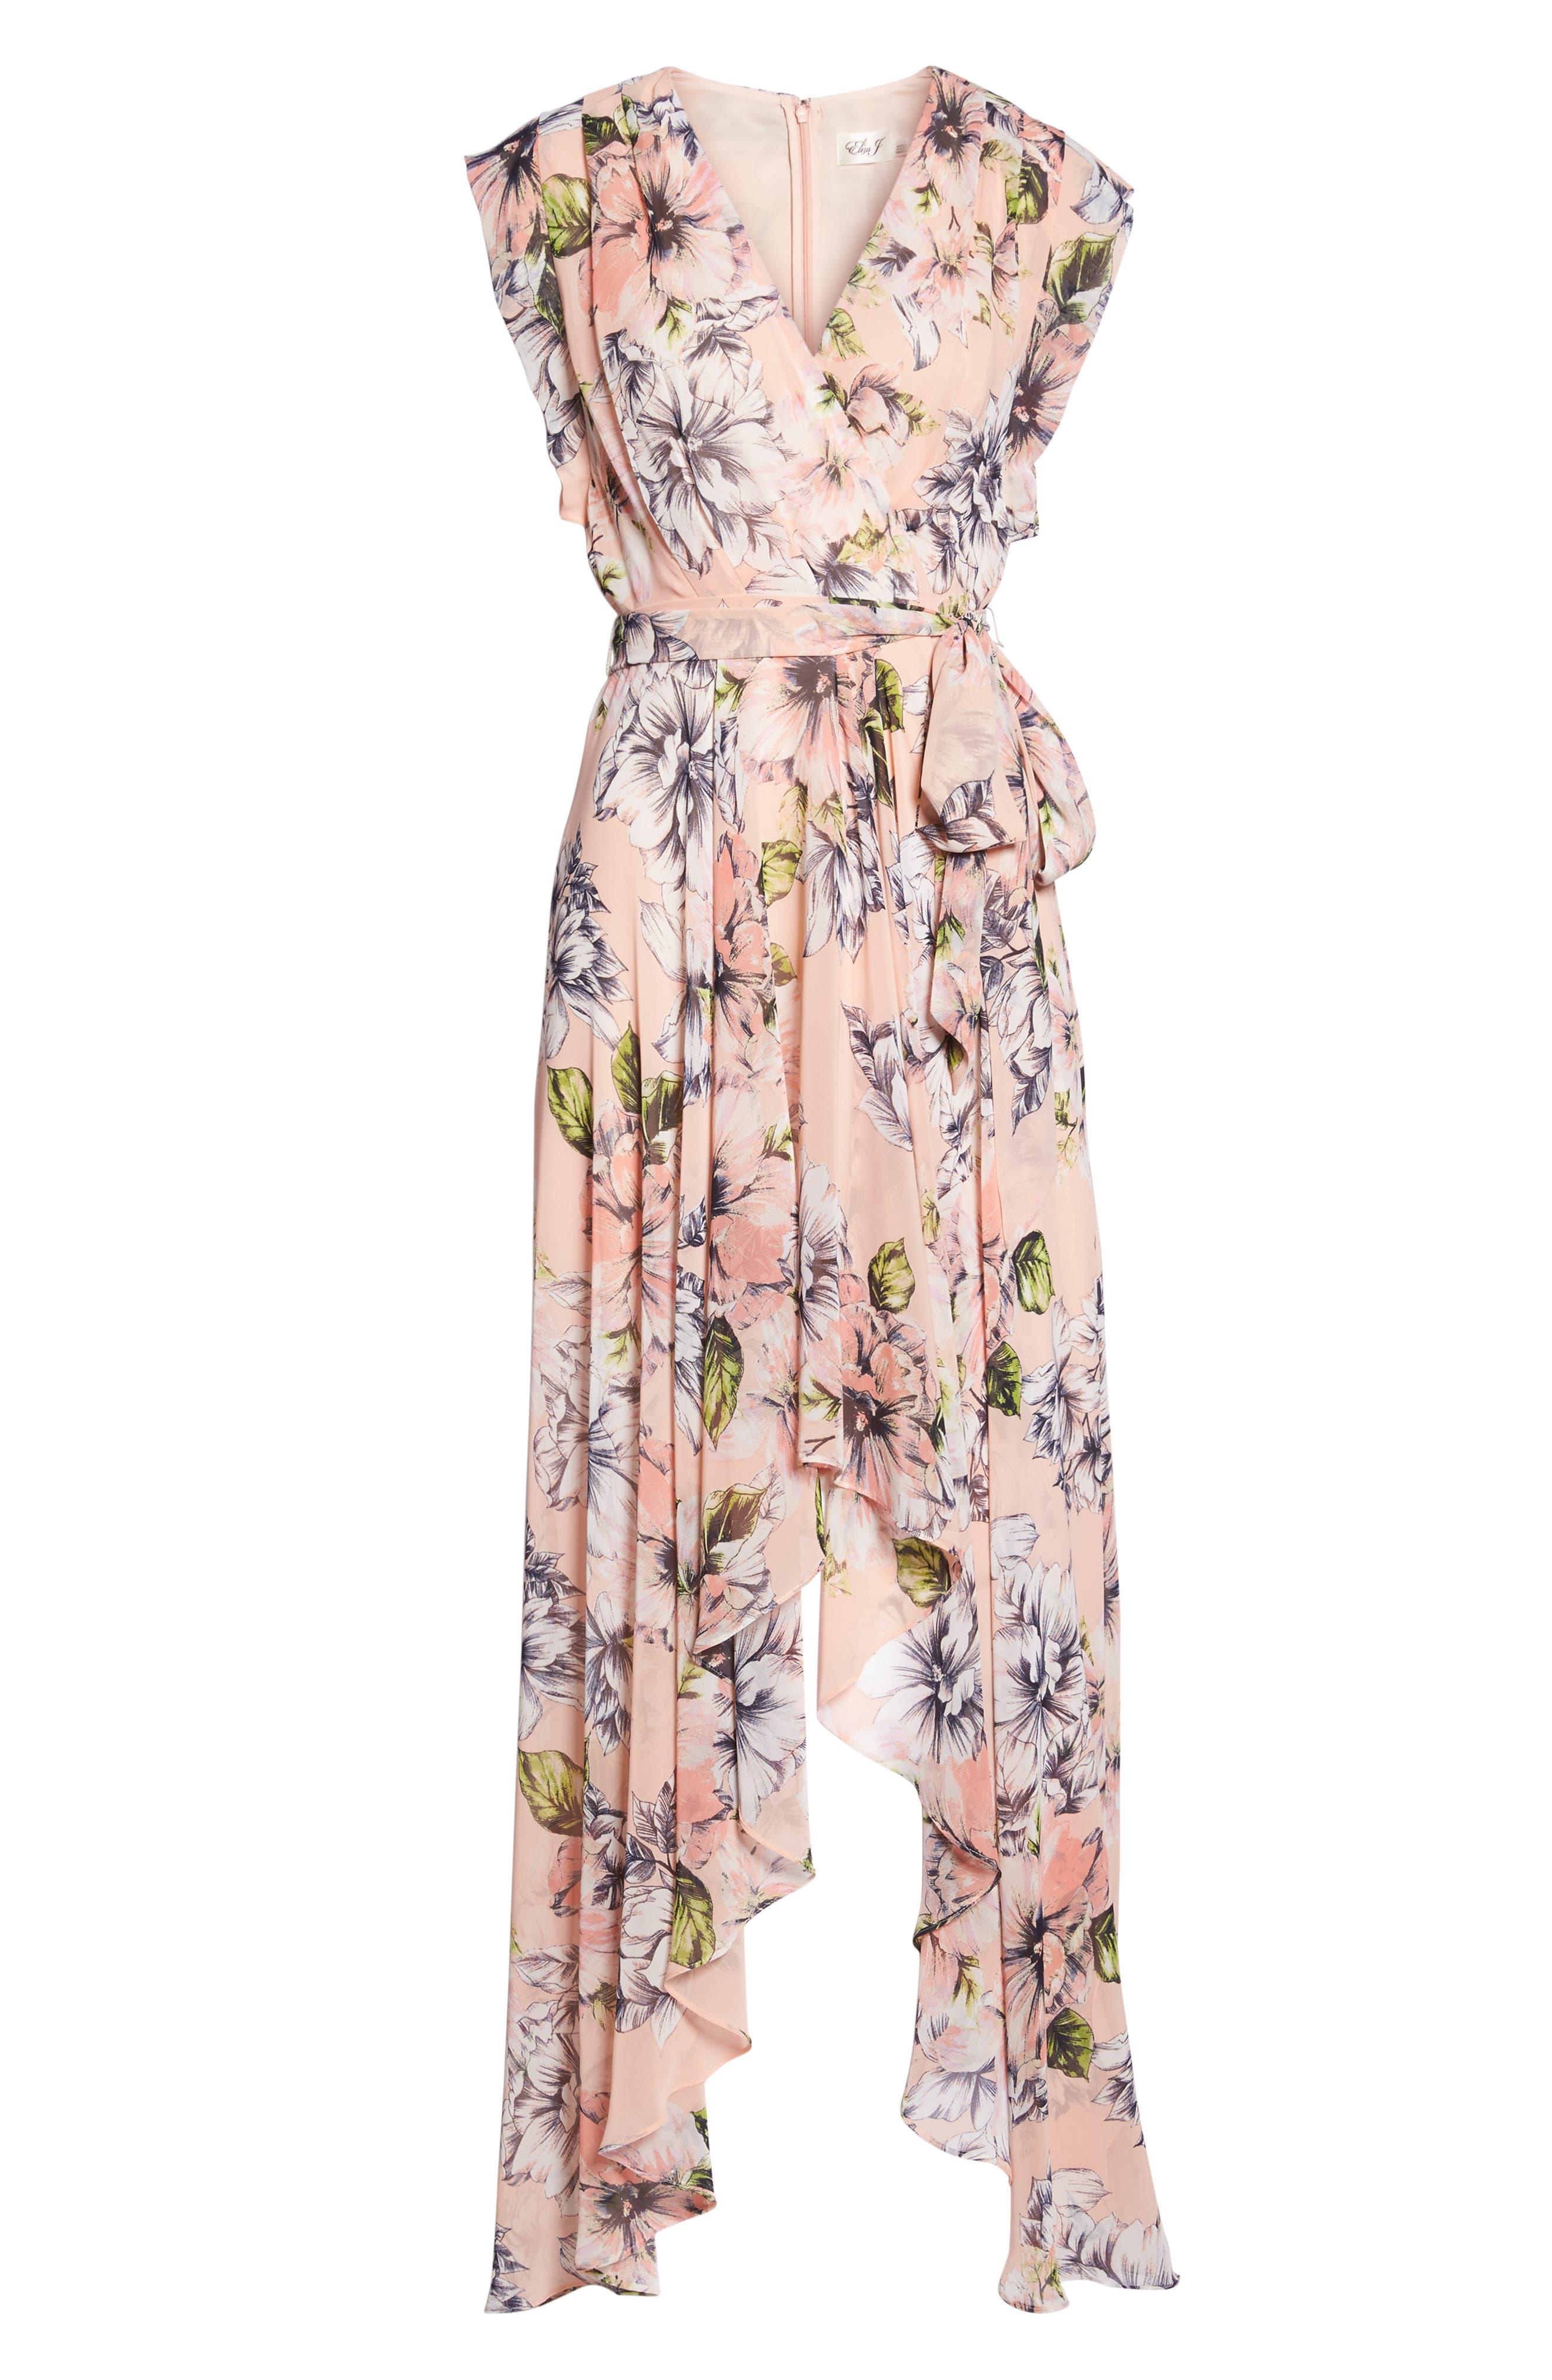 ELIZA J, Floral Ruffle High/Low Maxi Dress, Alternate thumbnail 7, color, BLUSH